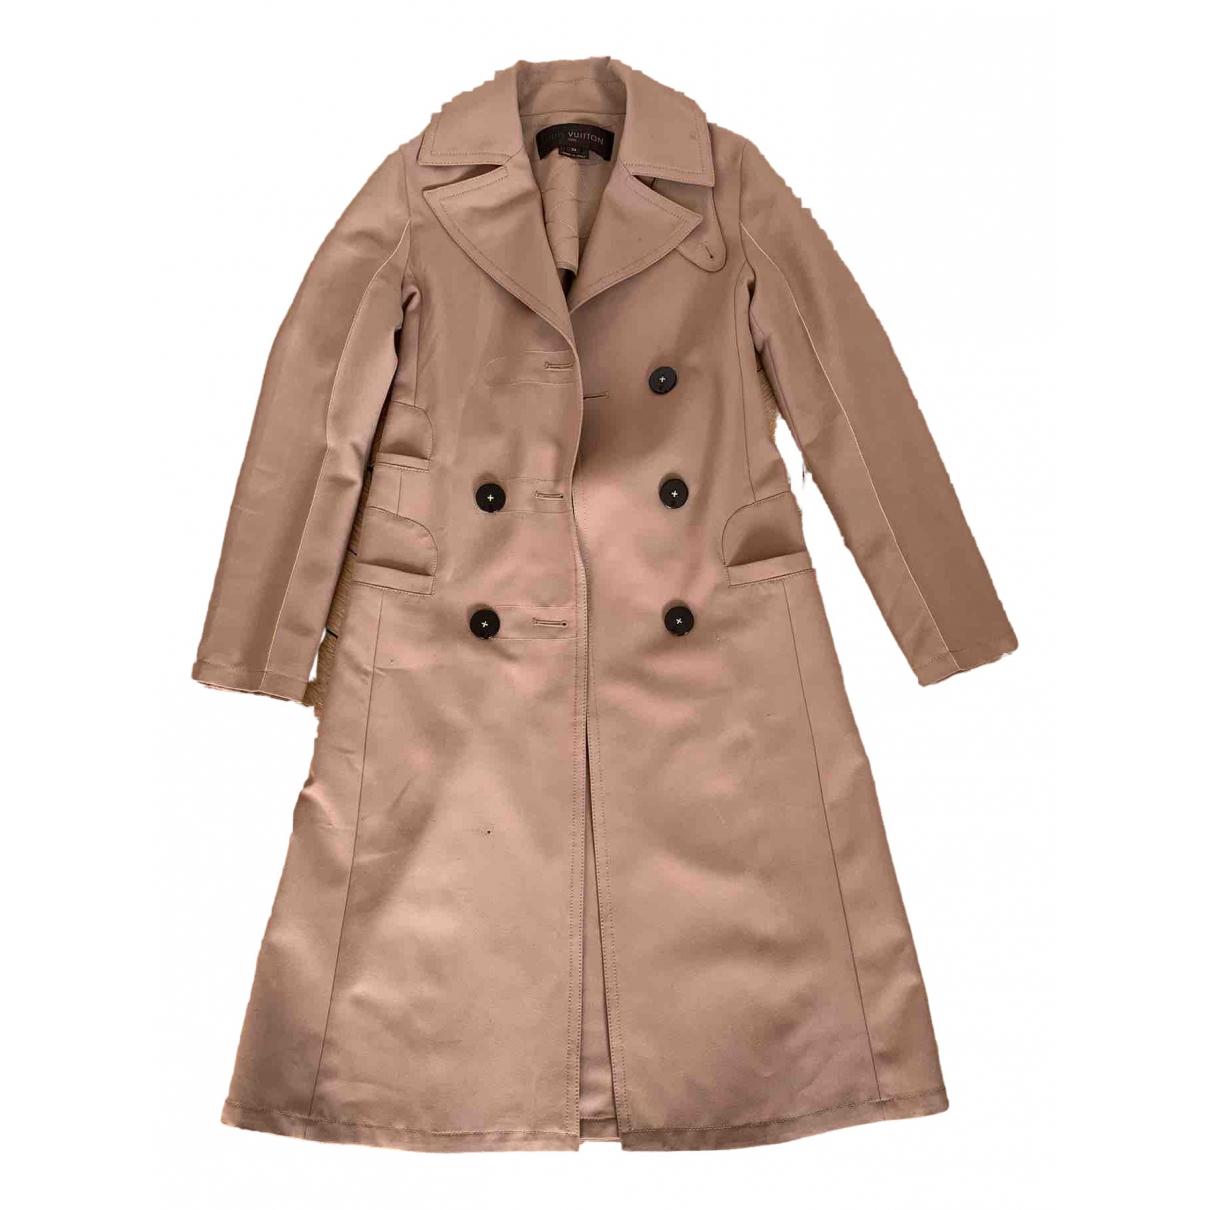 Louis Vuitton N Beige Cotton Trench coat for Women 34 FR